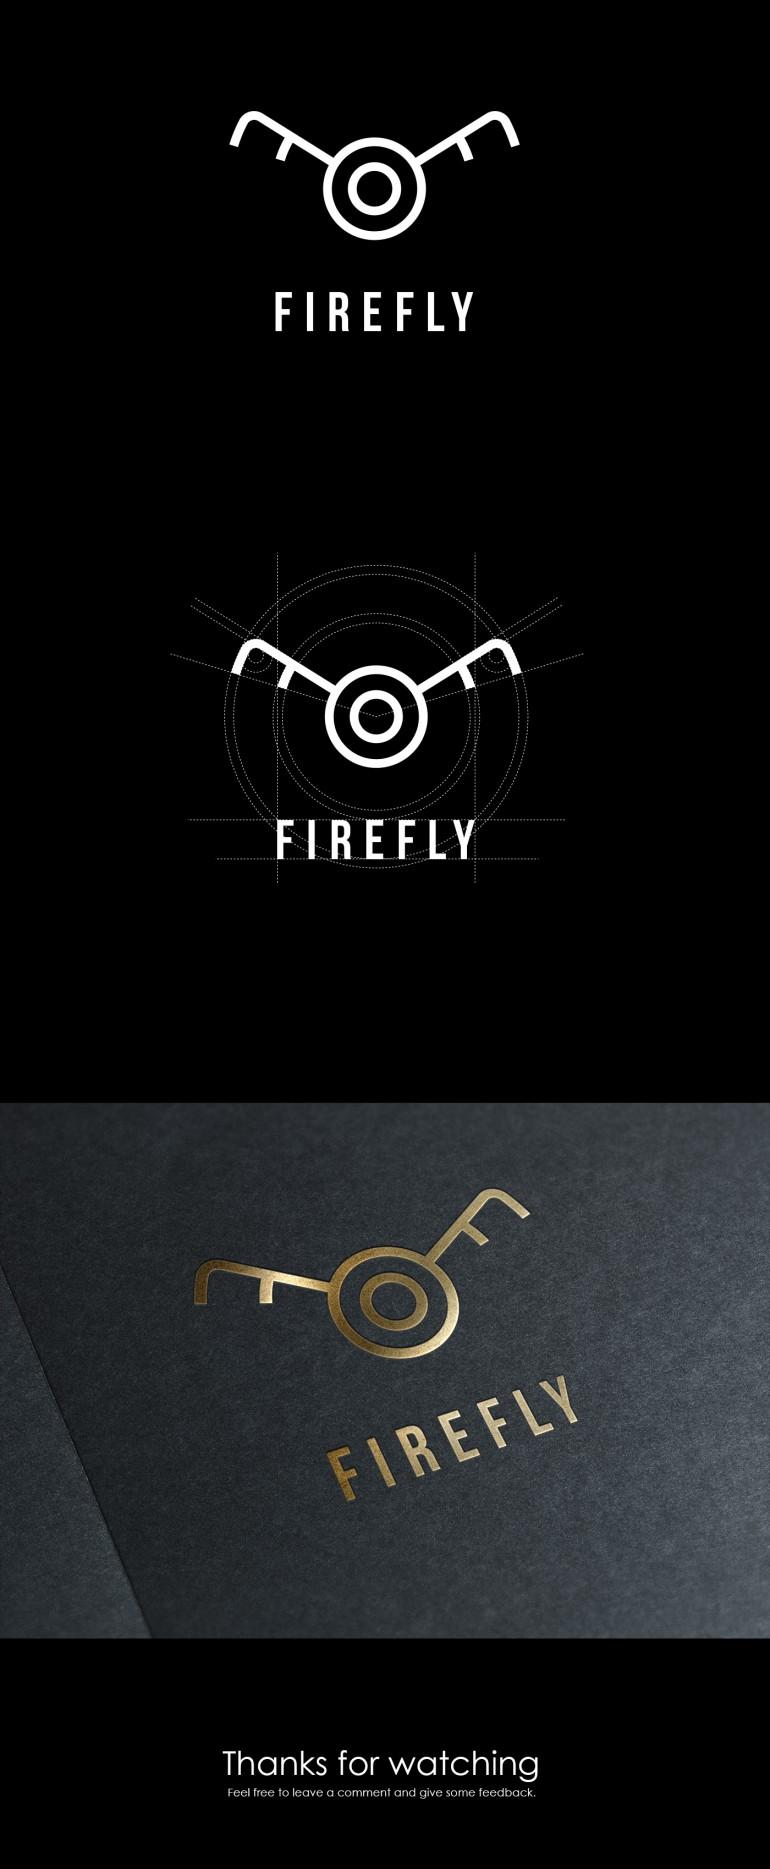 Firefly logo Design by Kevin van Eijk